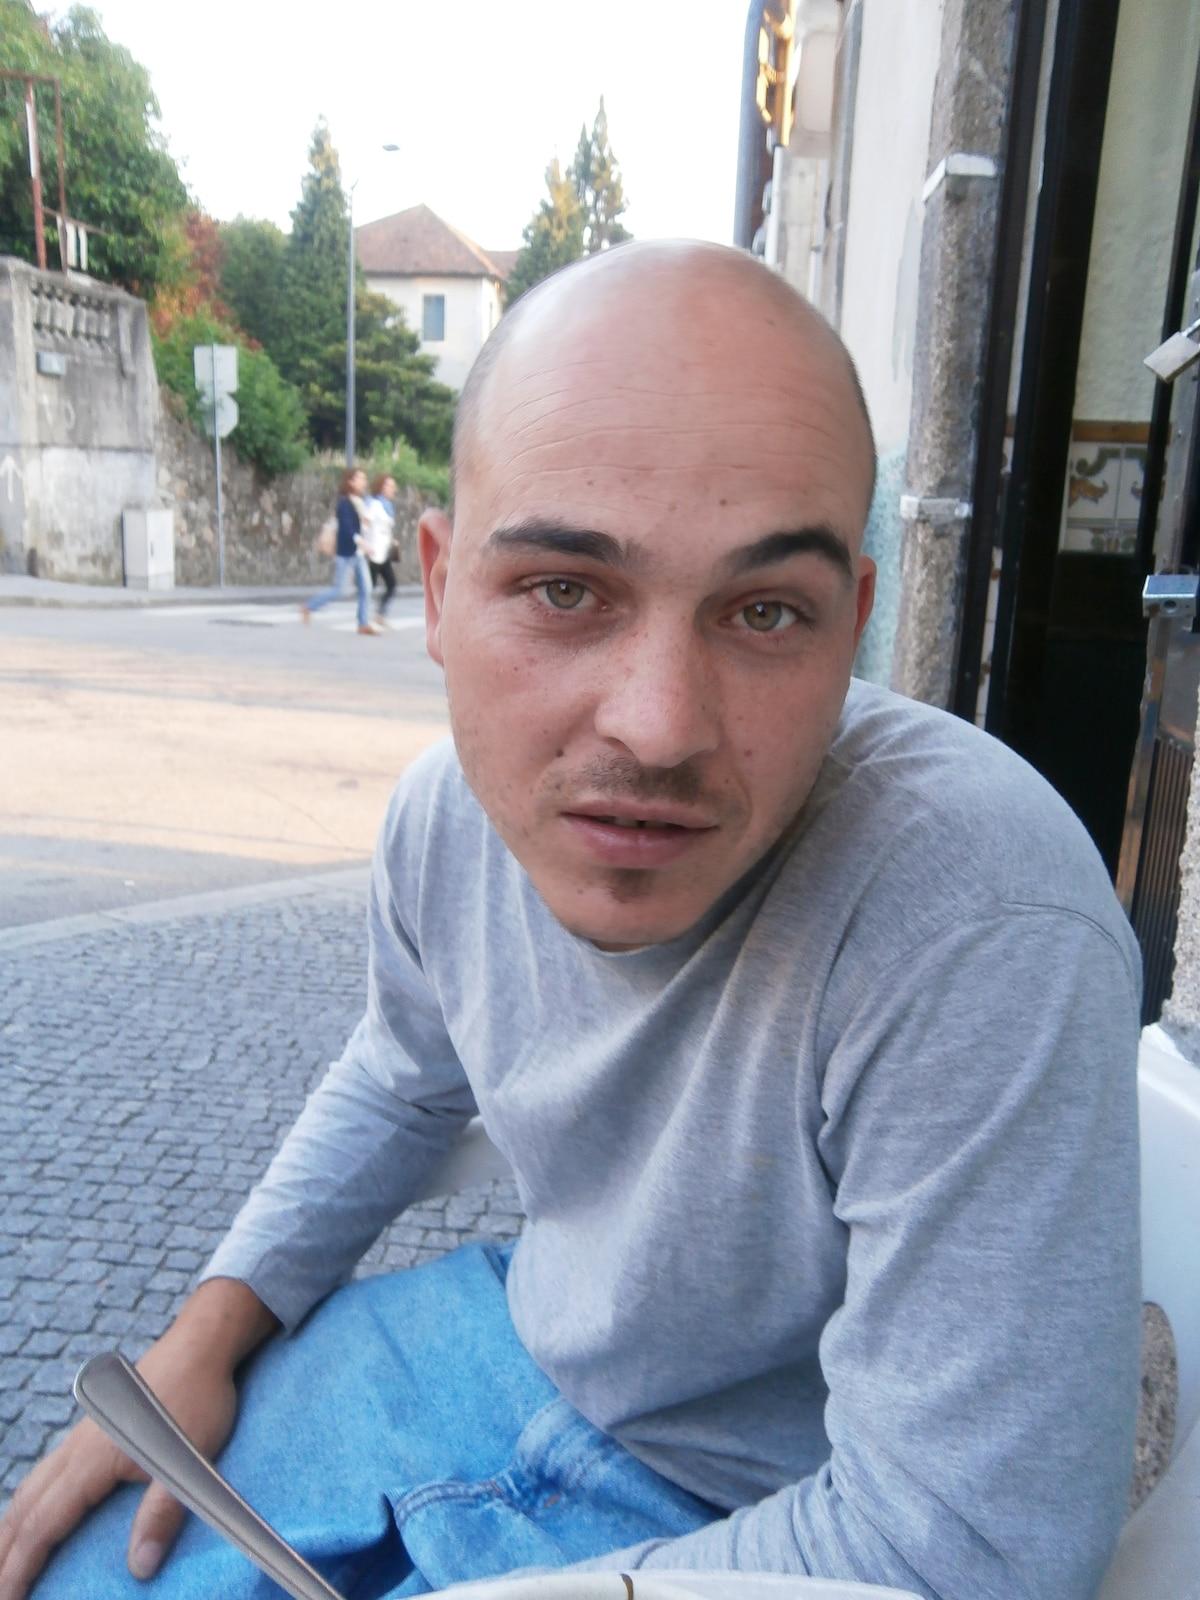 Pedro From Vila Nova de Gaia, Portugal